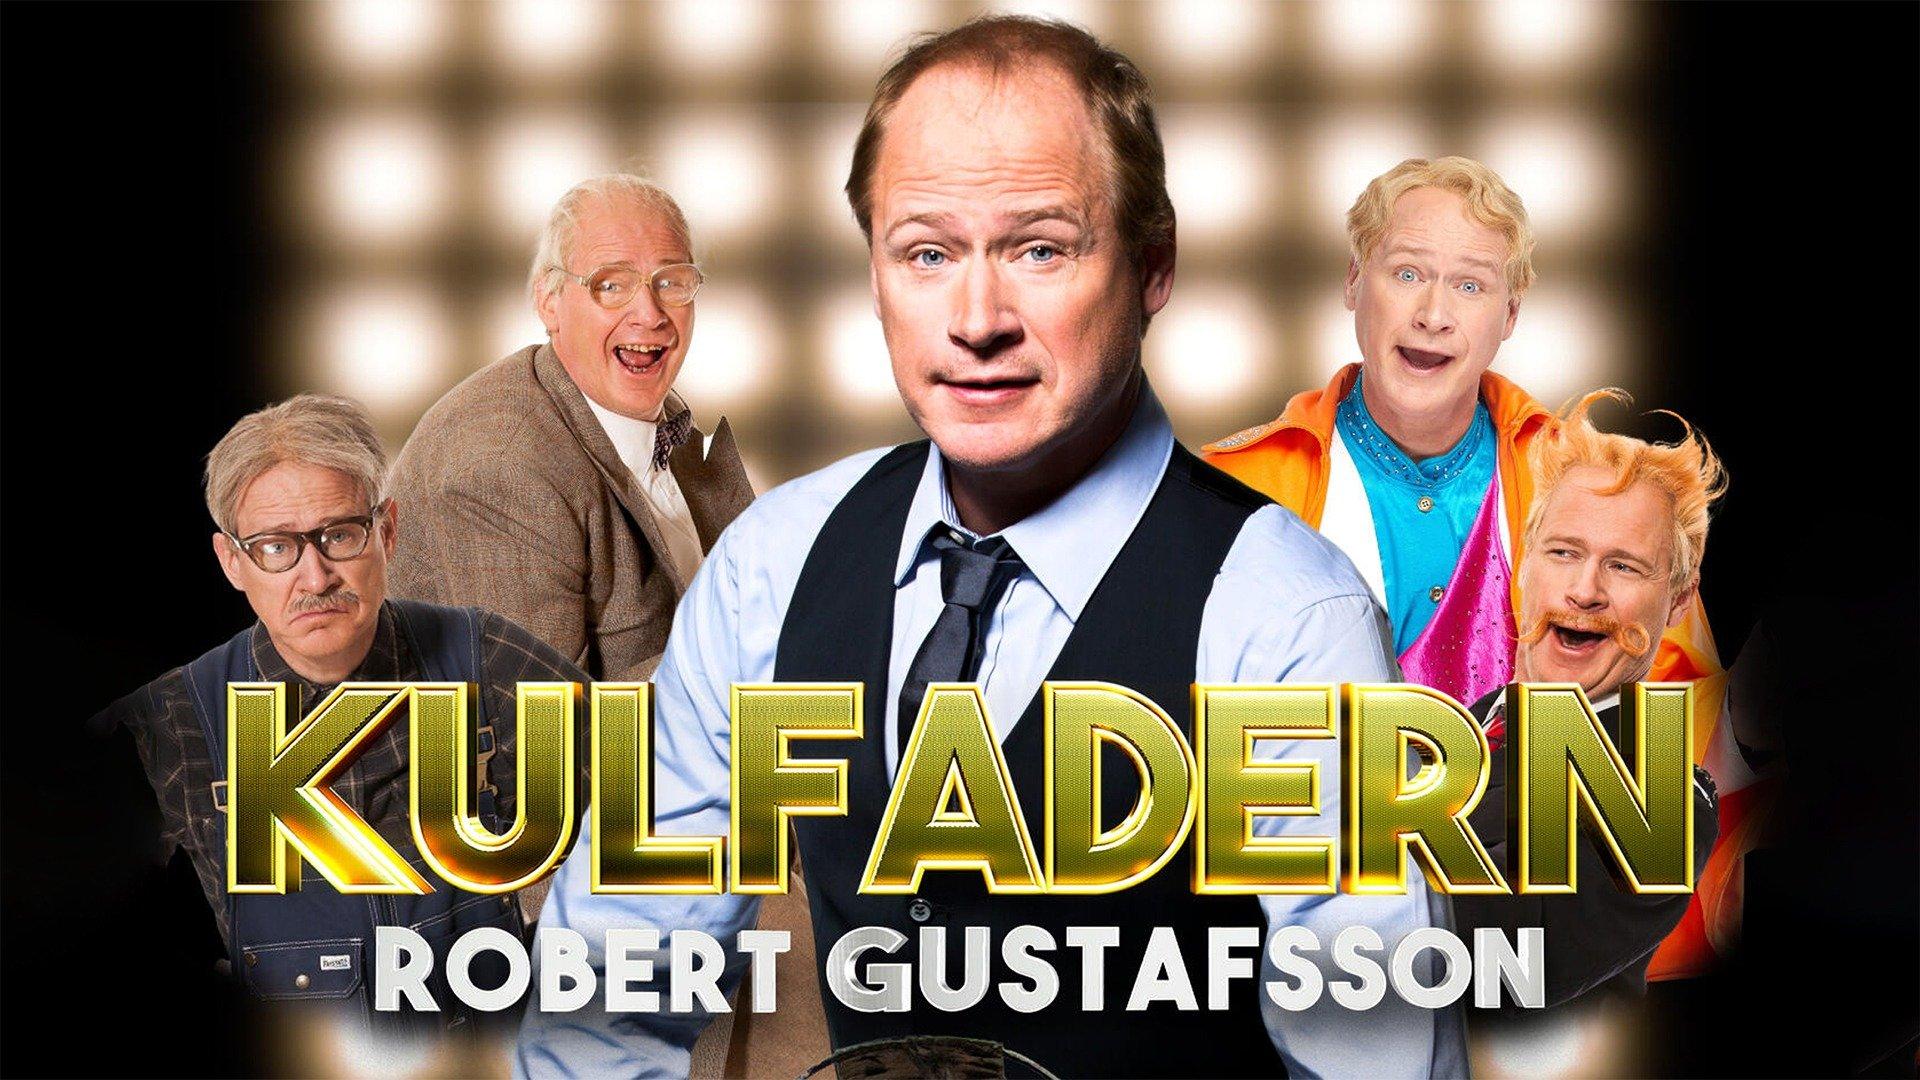 Robert Gustafsson - Kulfadern